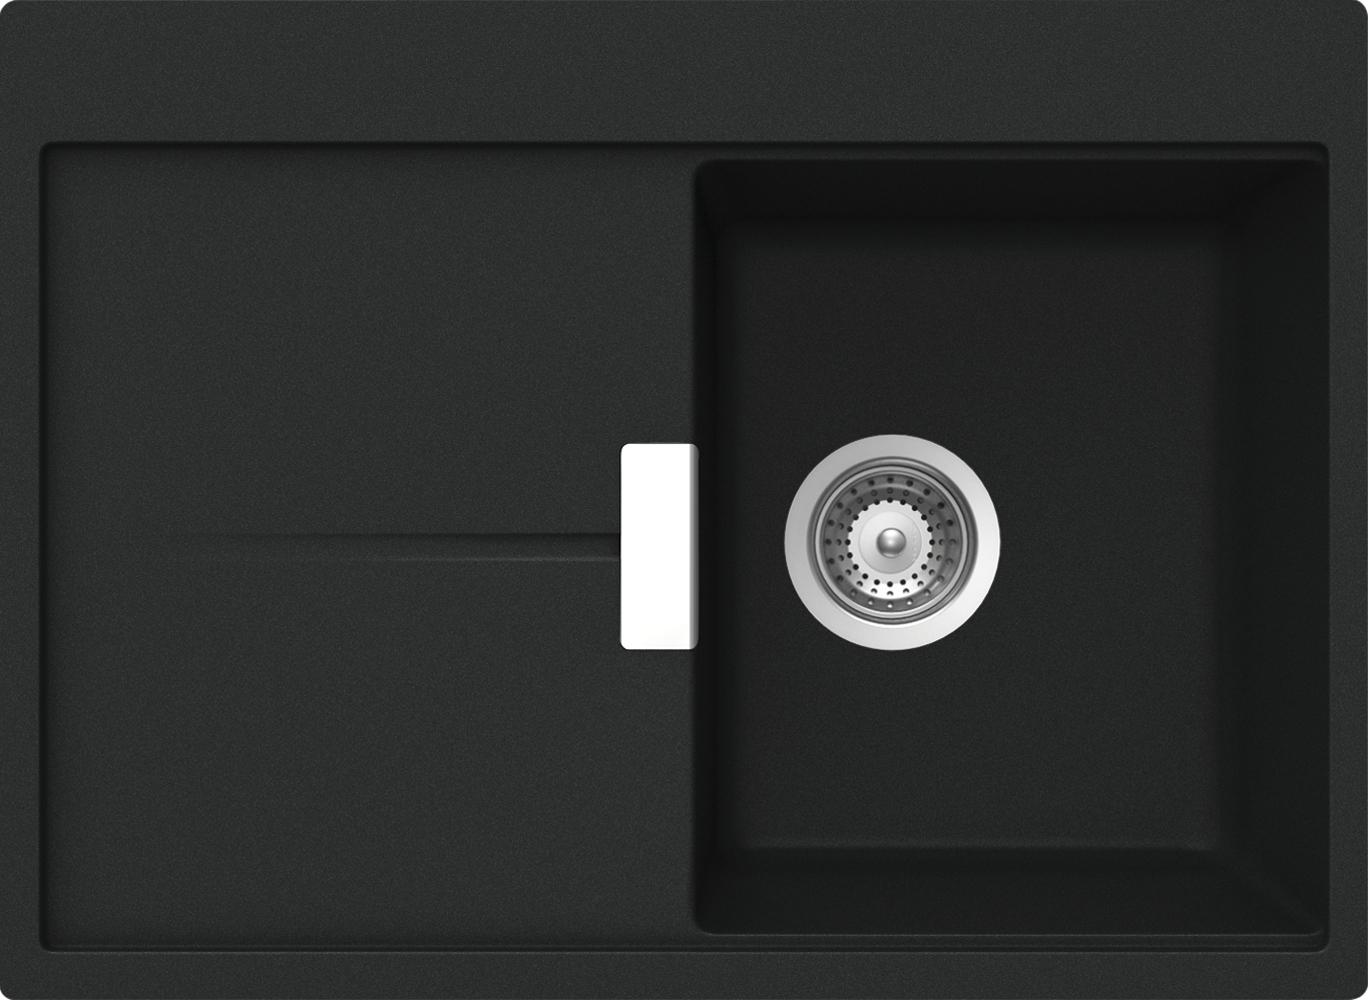 d ezy schock cristadur jednod ezy s odkapem schock horizont d 100s magma granitov d ezy. Black Bedroom Furniture Sets. Home Design Ideas